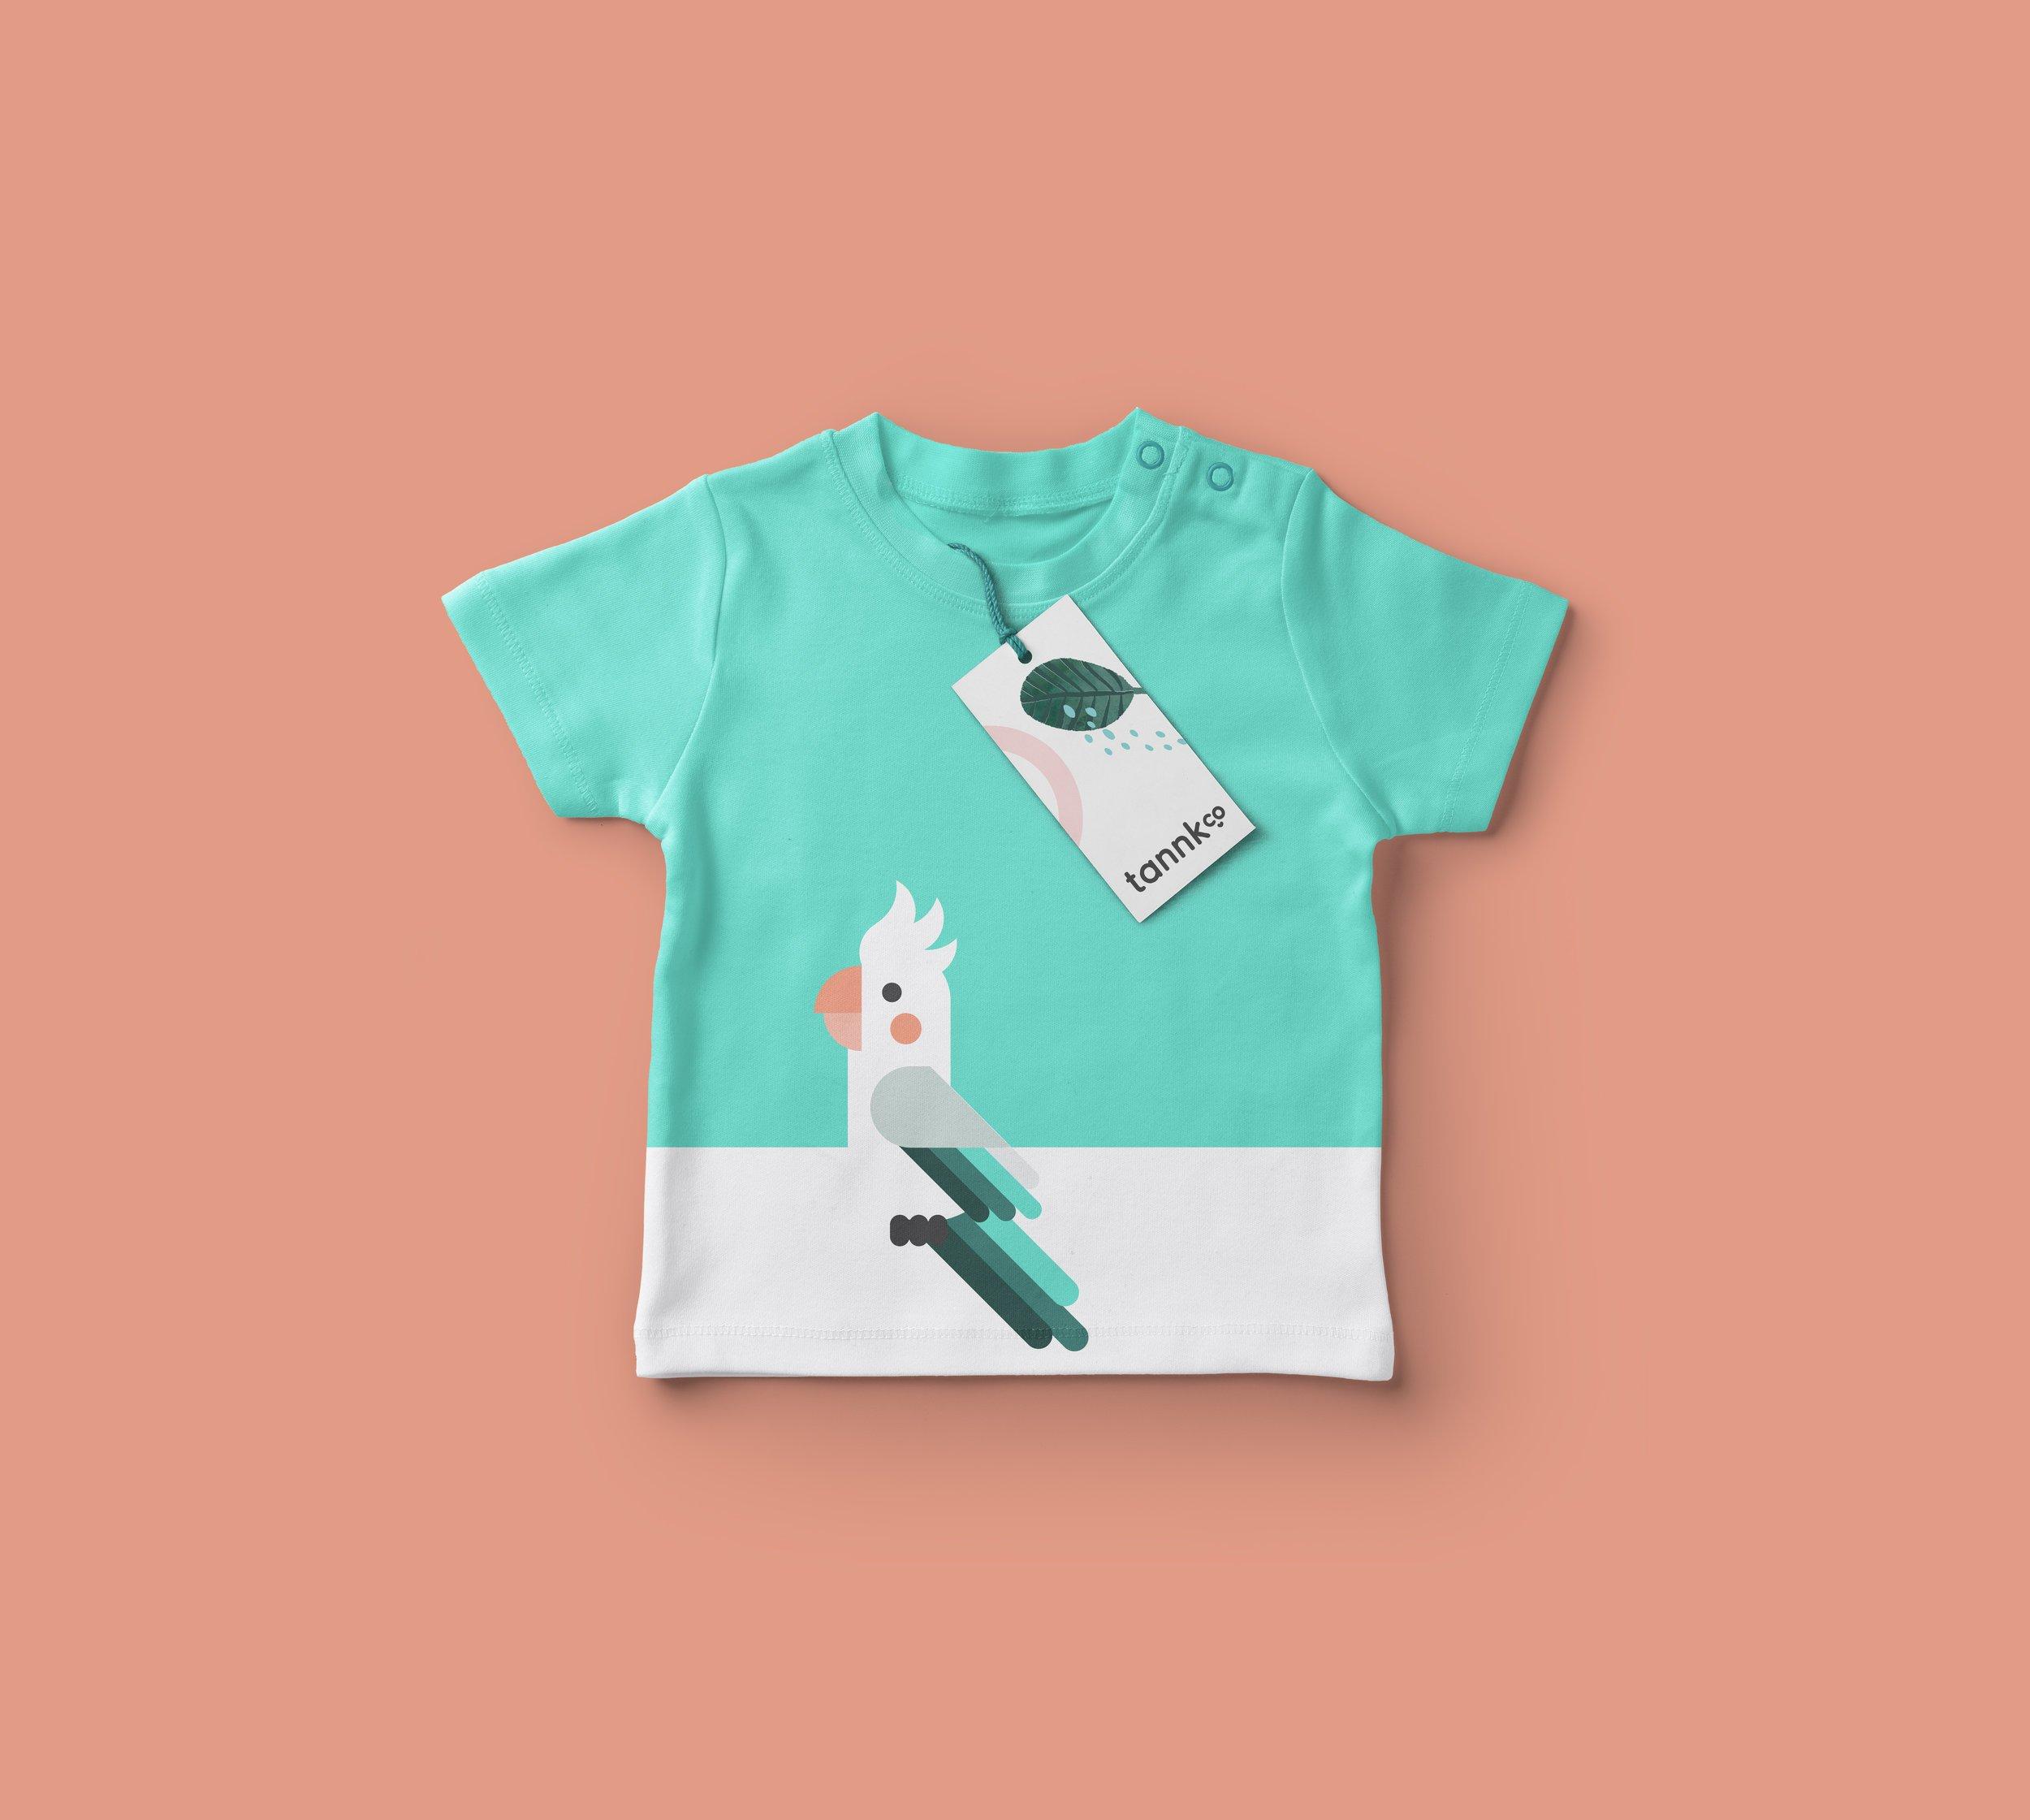 Tannk clothes design